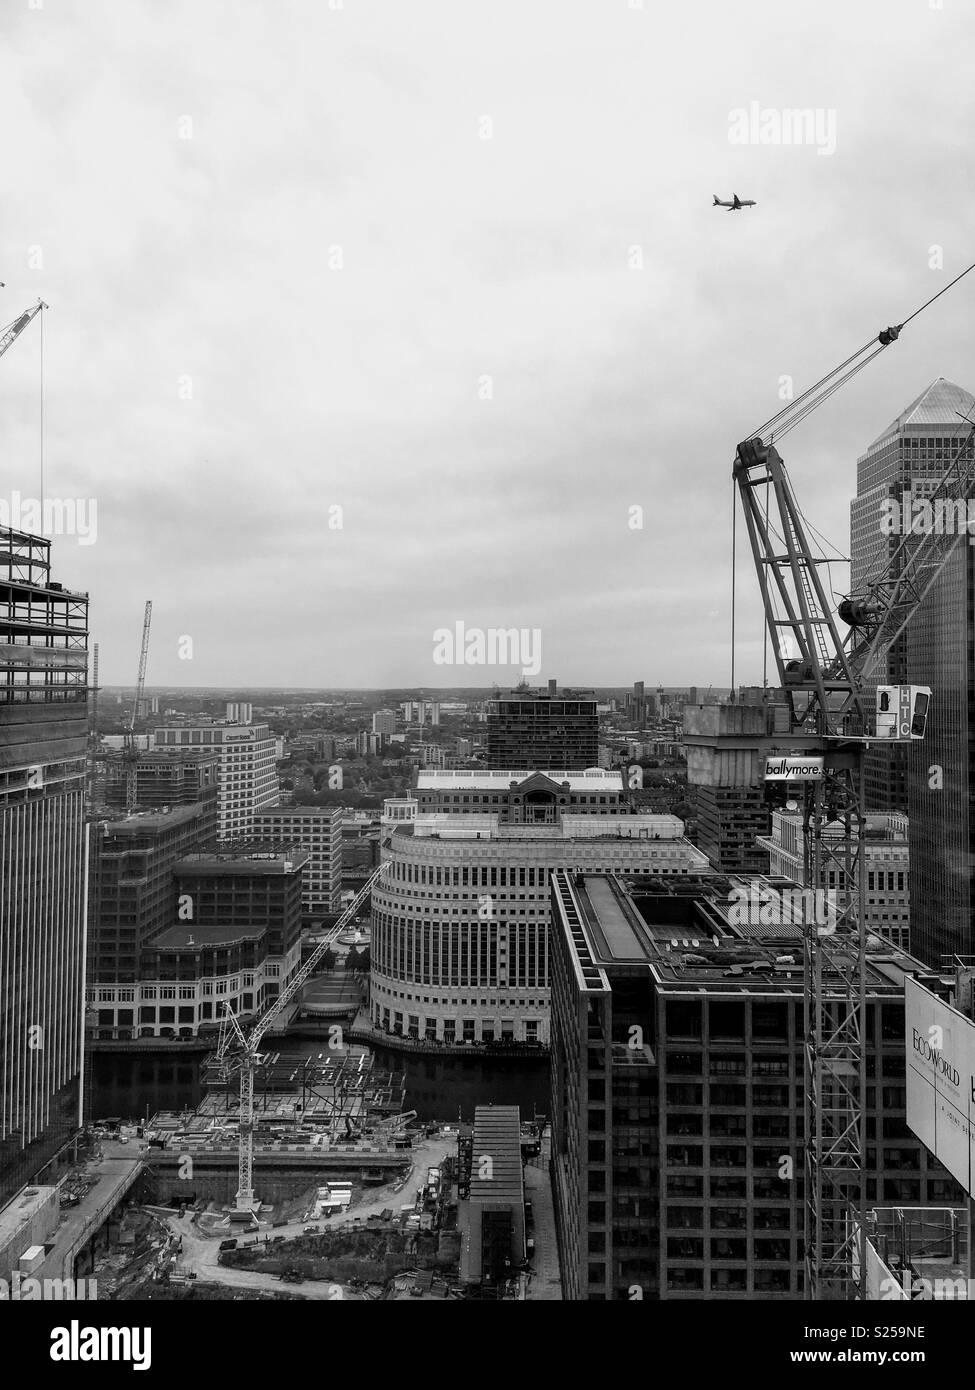 Canary Wharf West Skyline - Stock Image